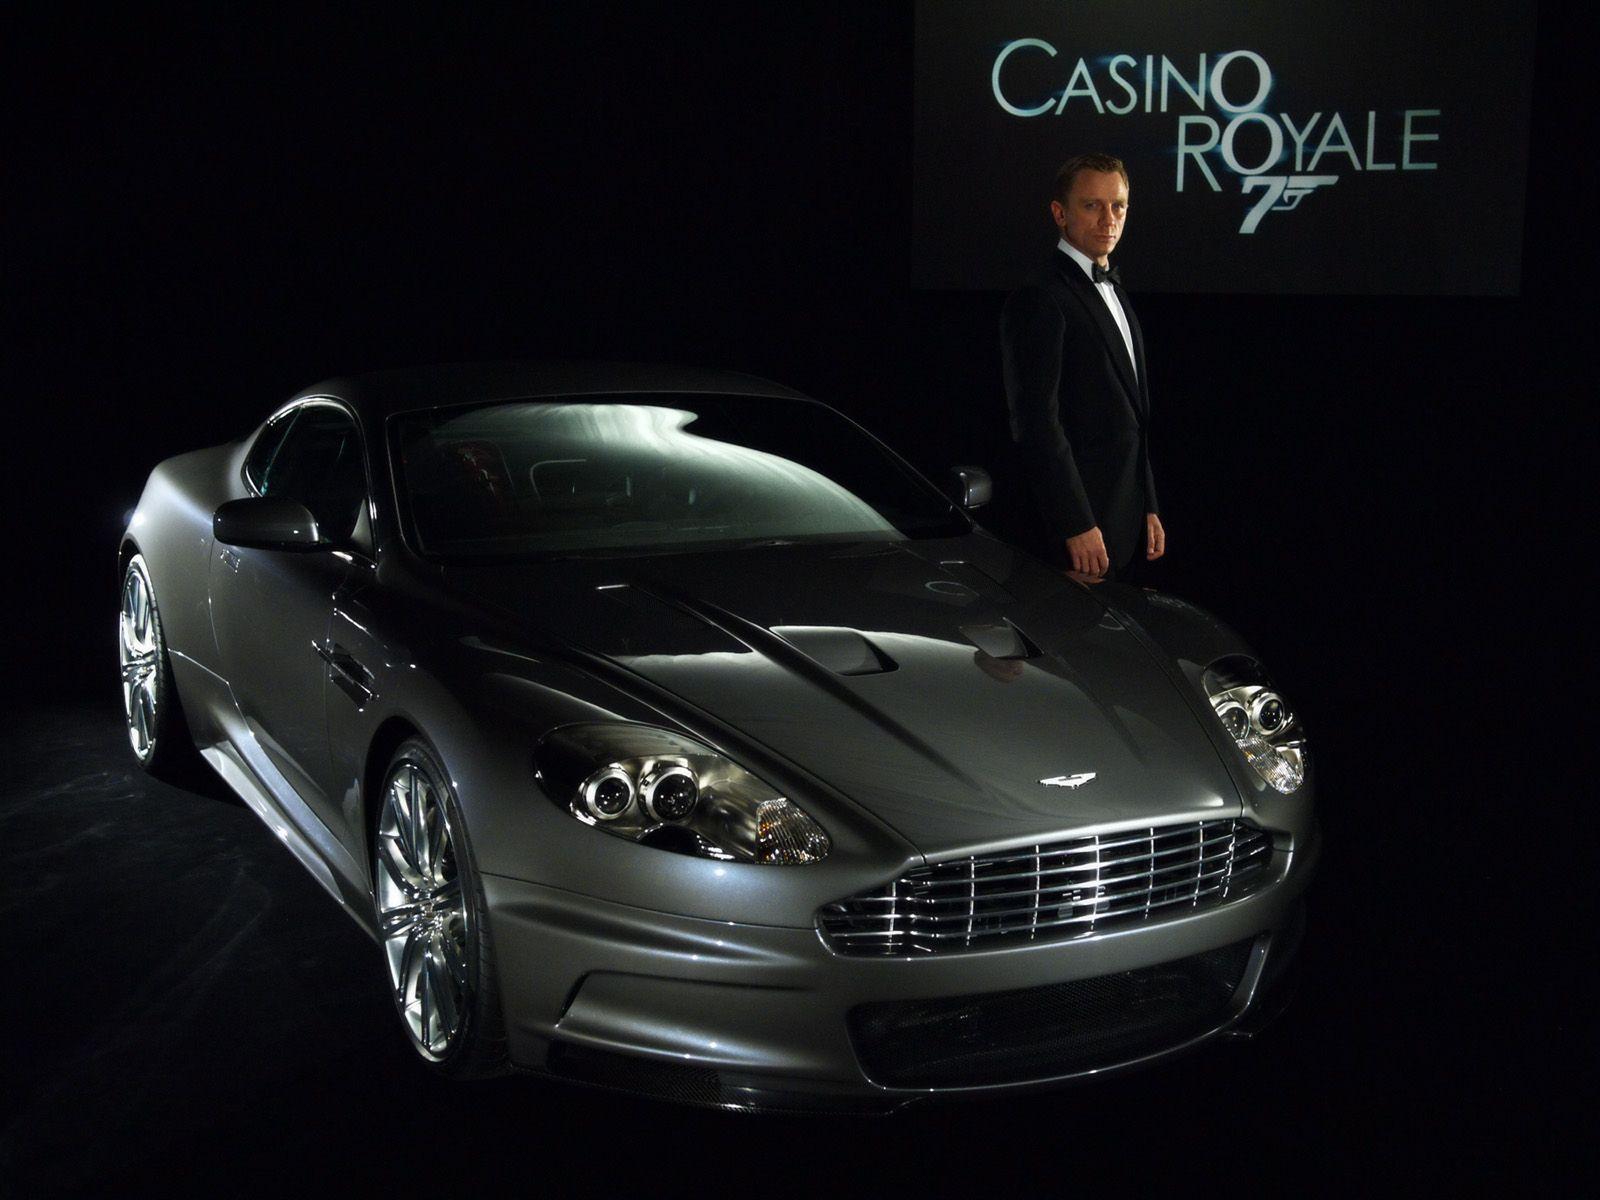 James Bond Hd Wallpapers Wallpaper Cave